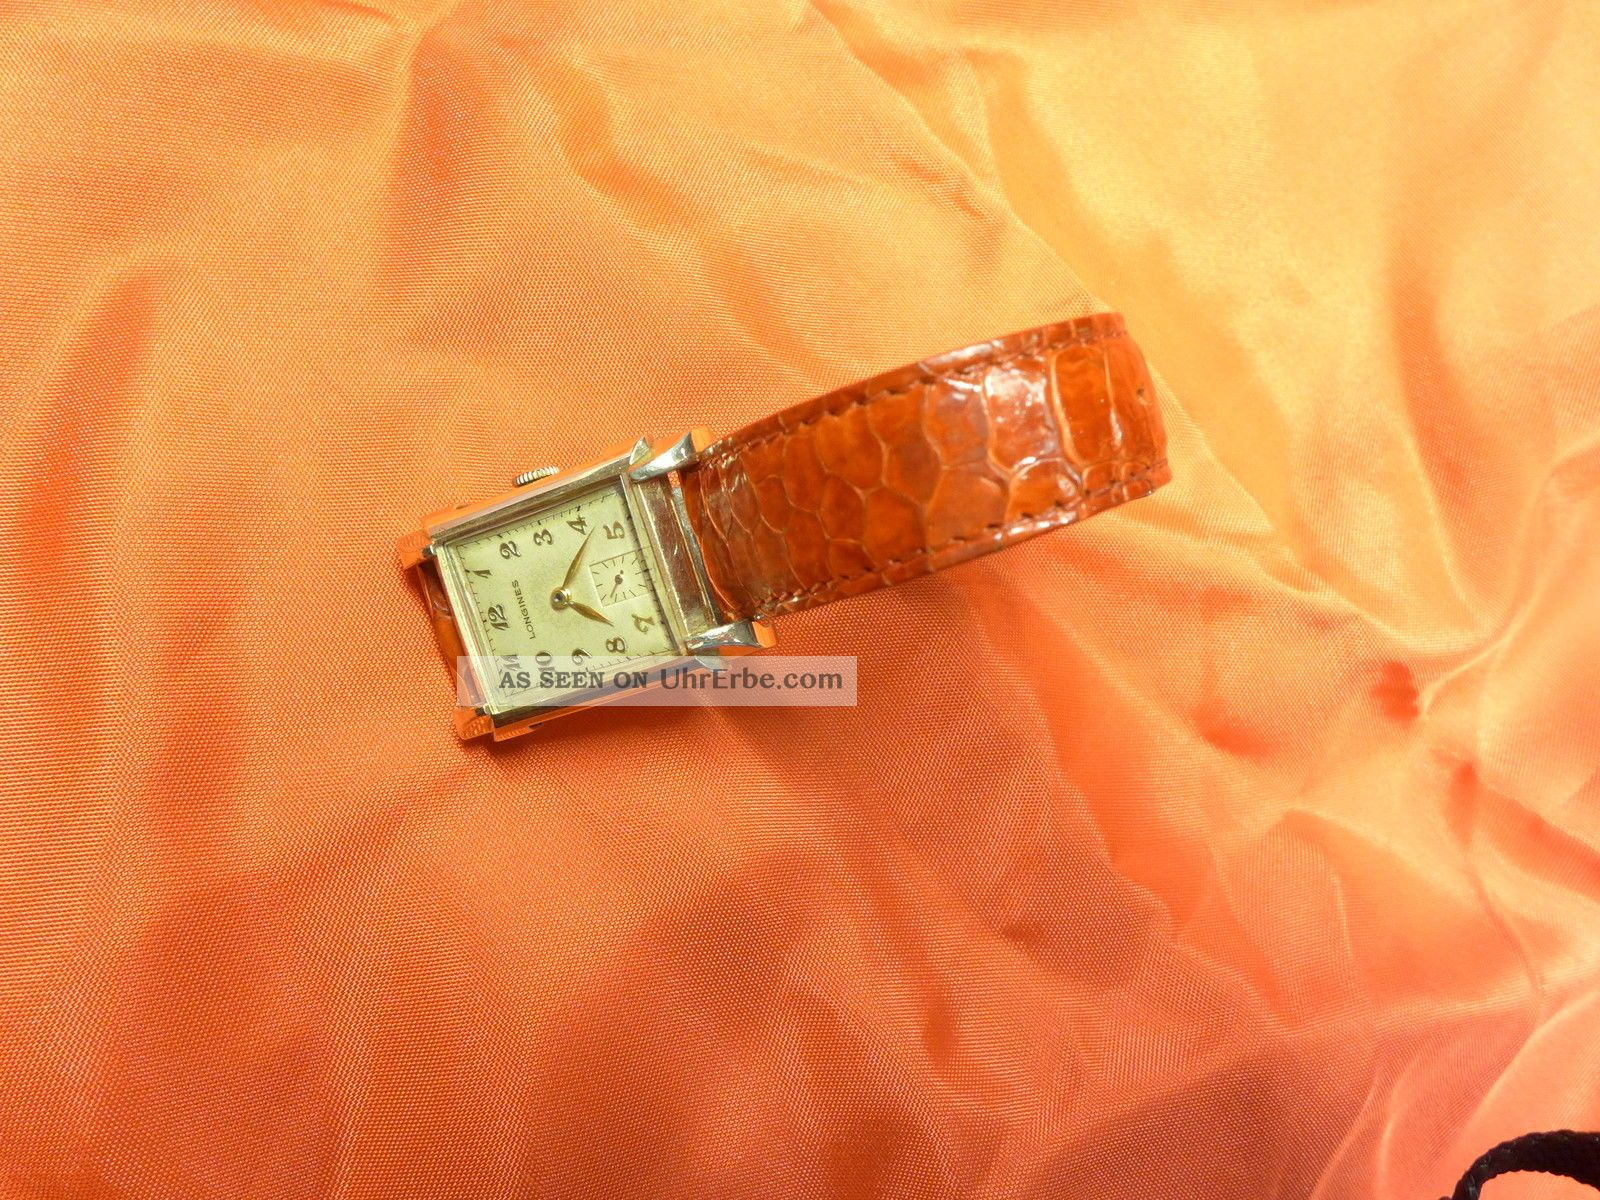 Longines Uhr Gold 10 K Swiss Mechanisch Uhrwerk Lederarmband Armbanduhren Bild